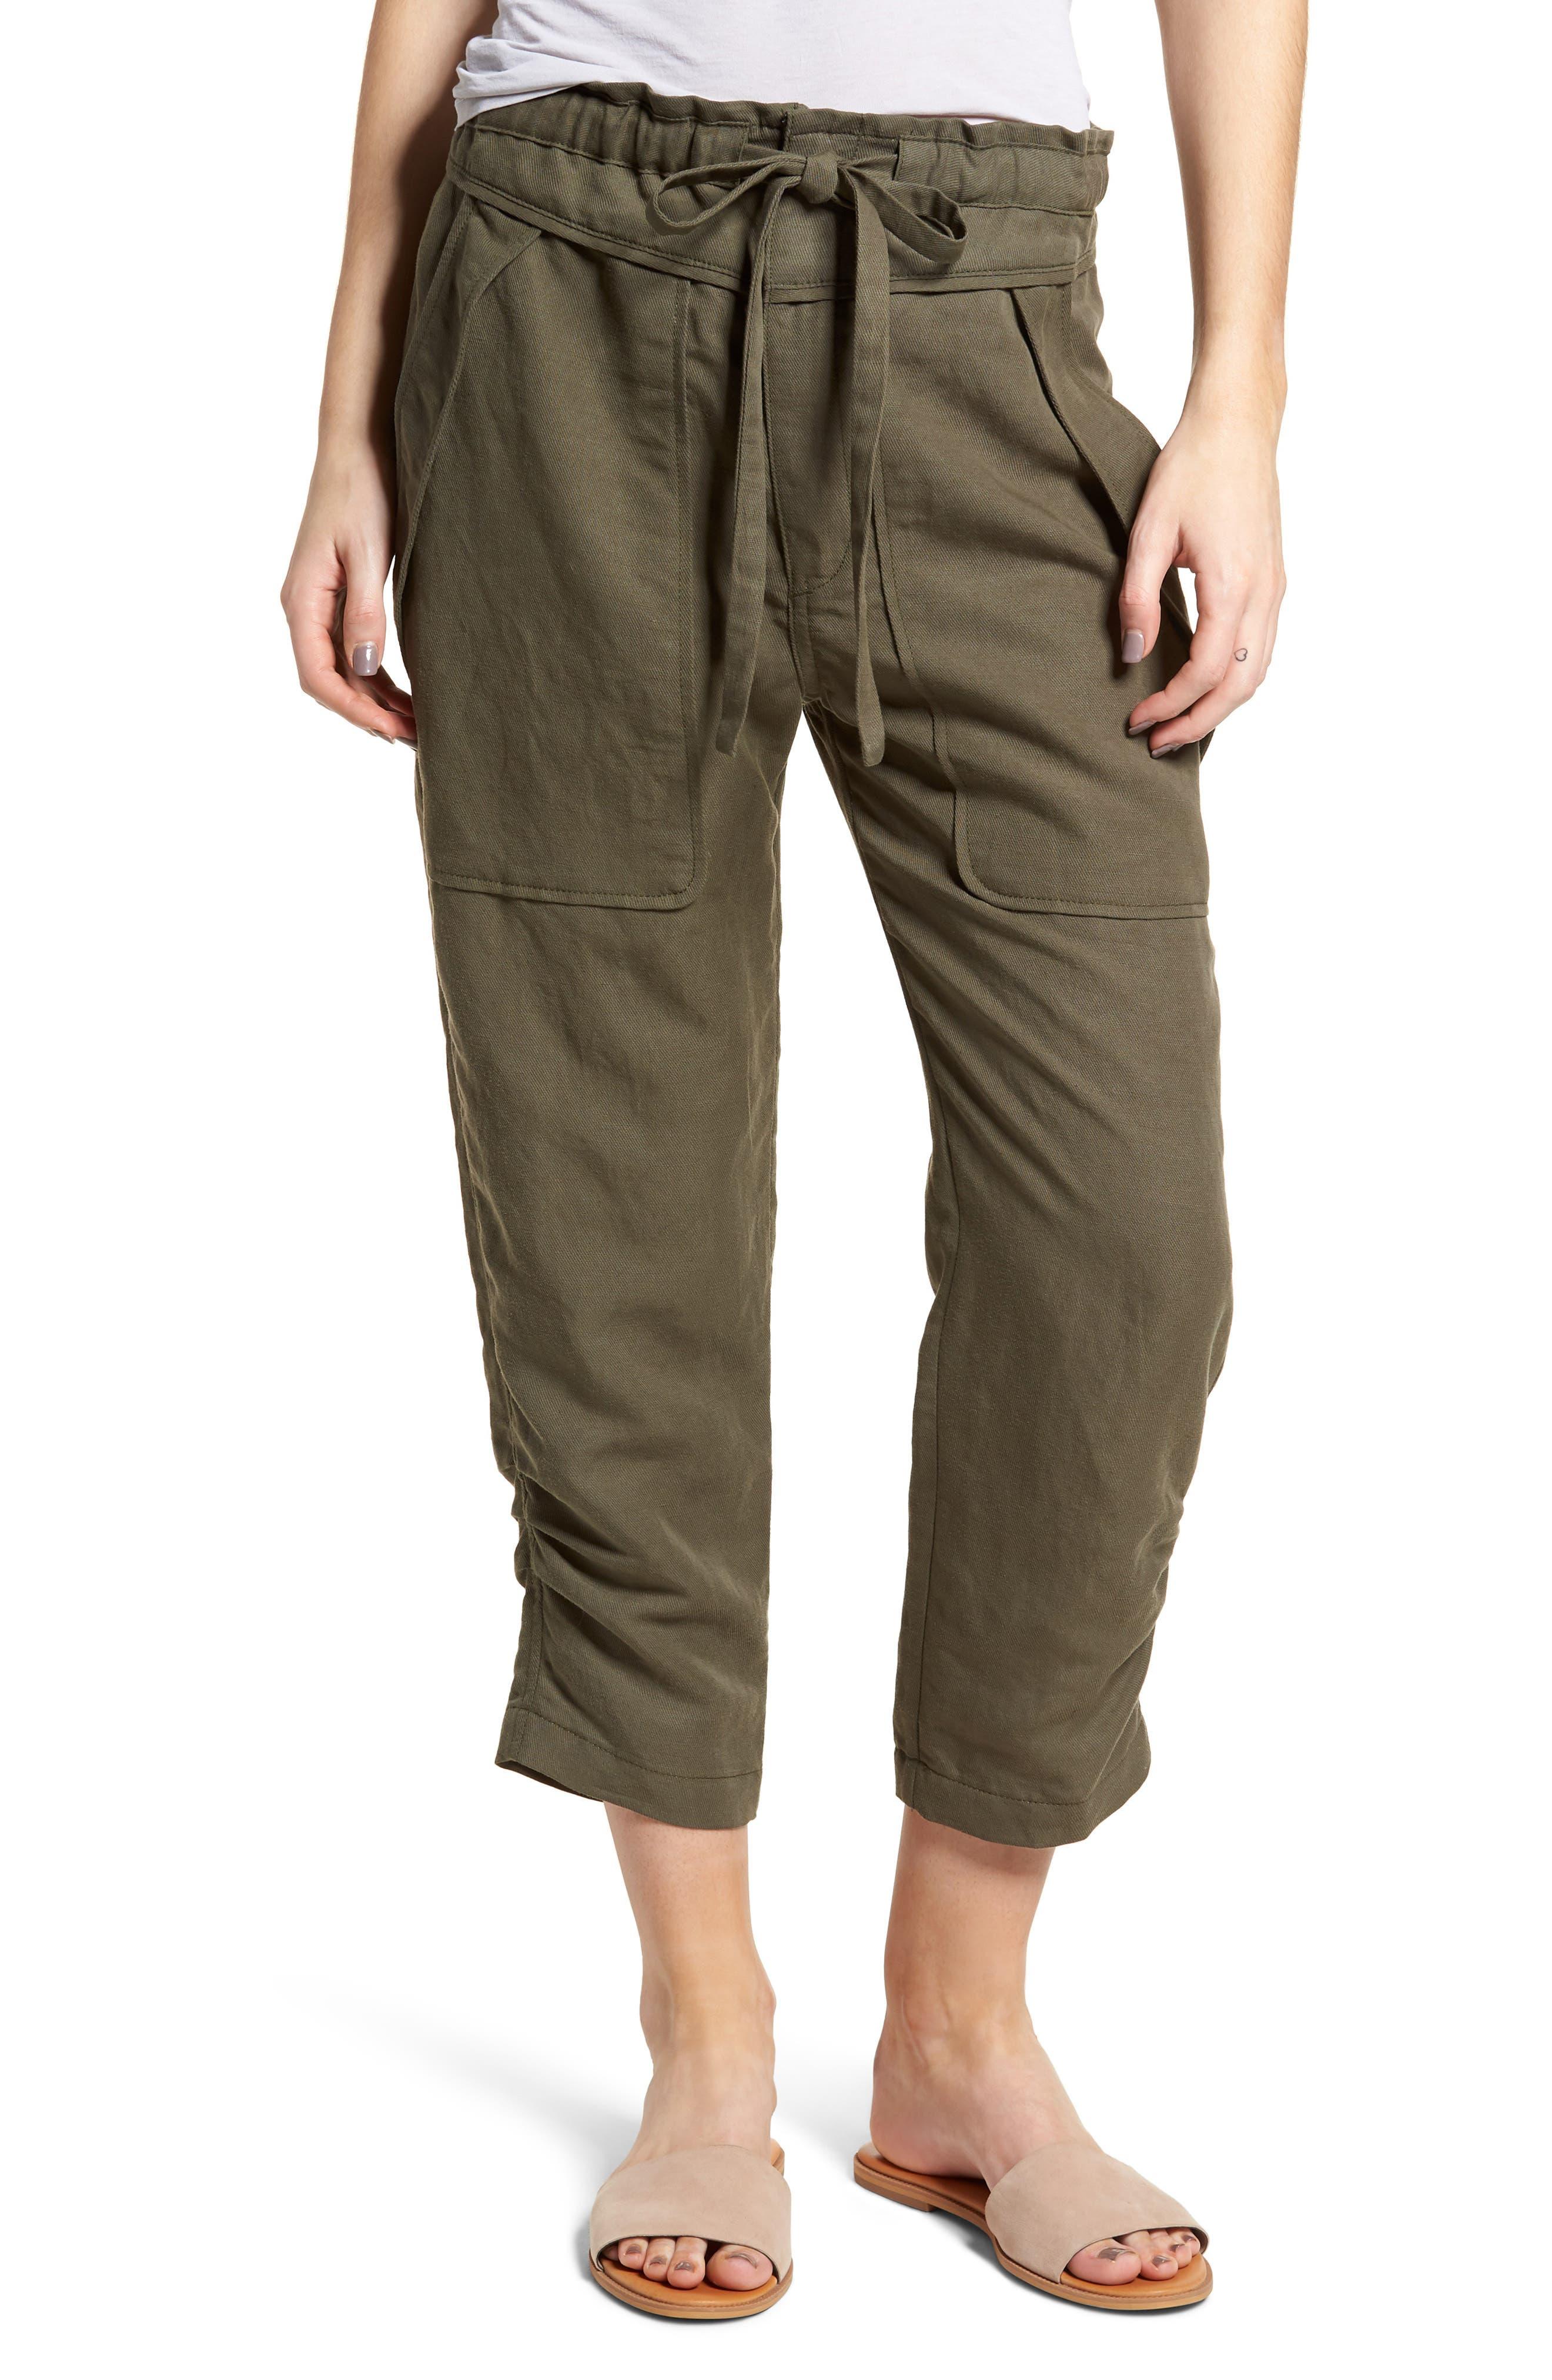 Stellina High Waist Pants,                             Main thumbnail 1, color,                             Verdant